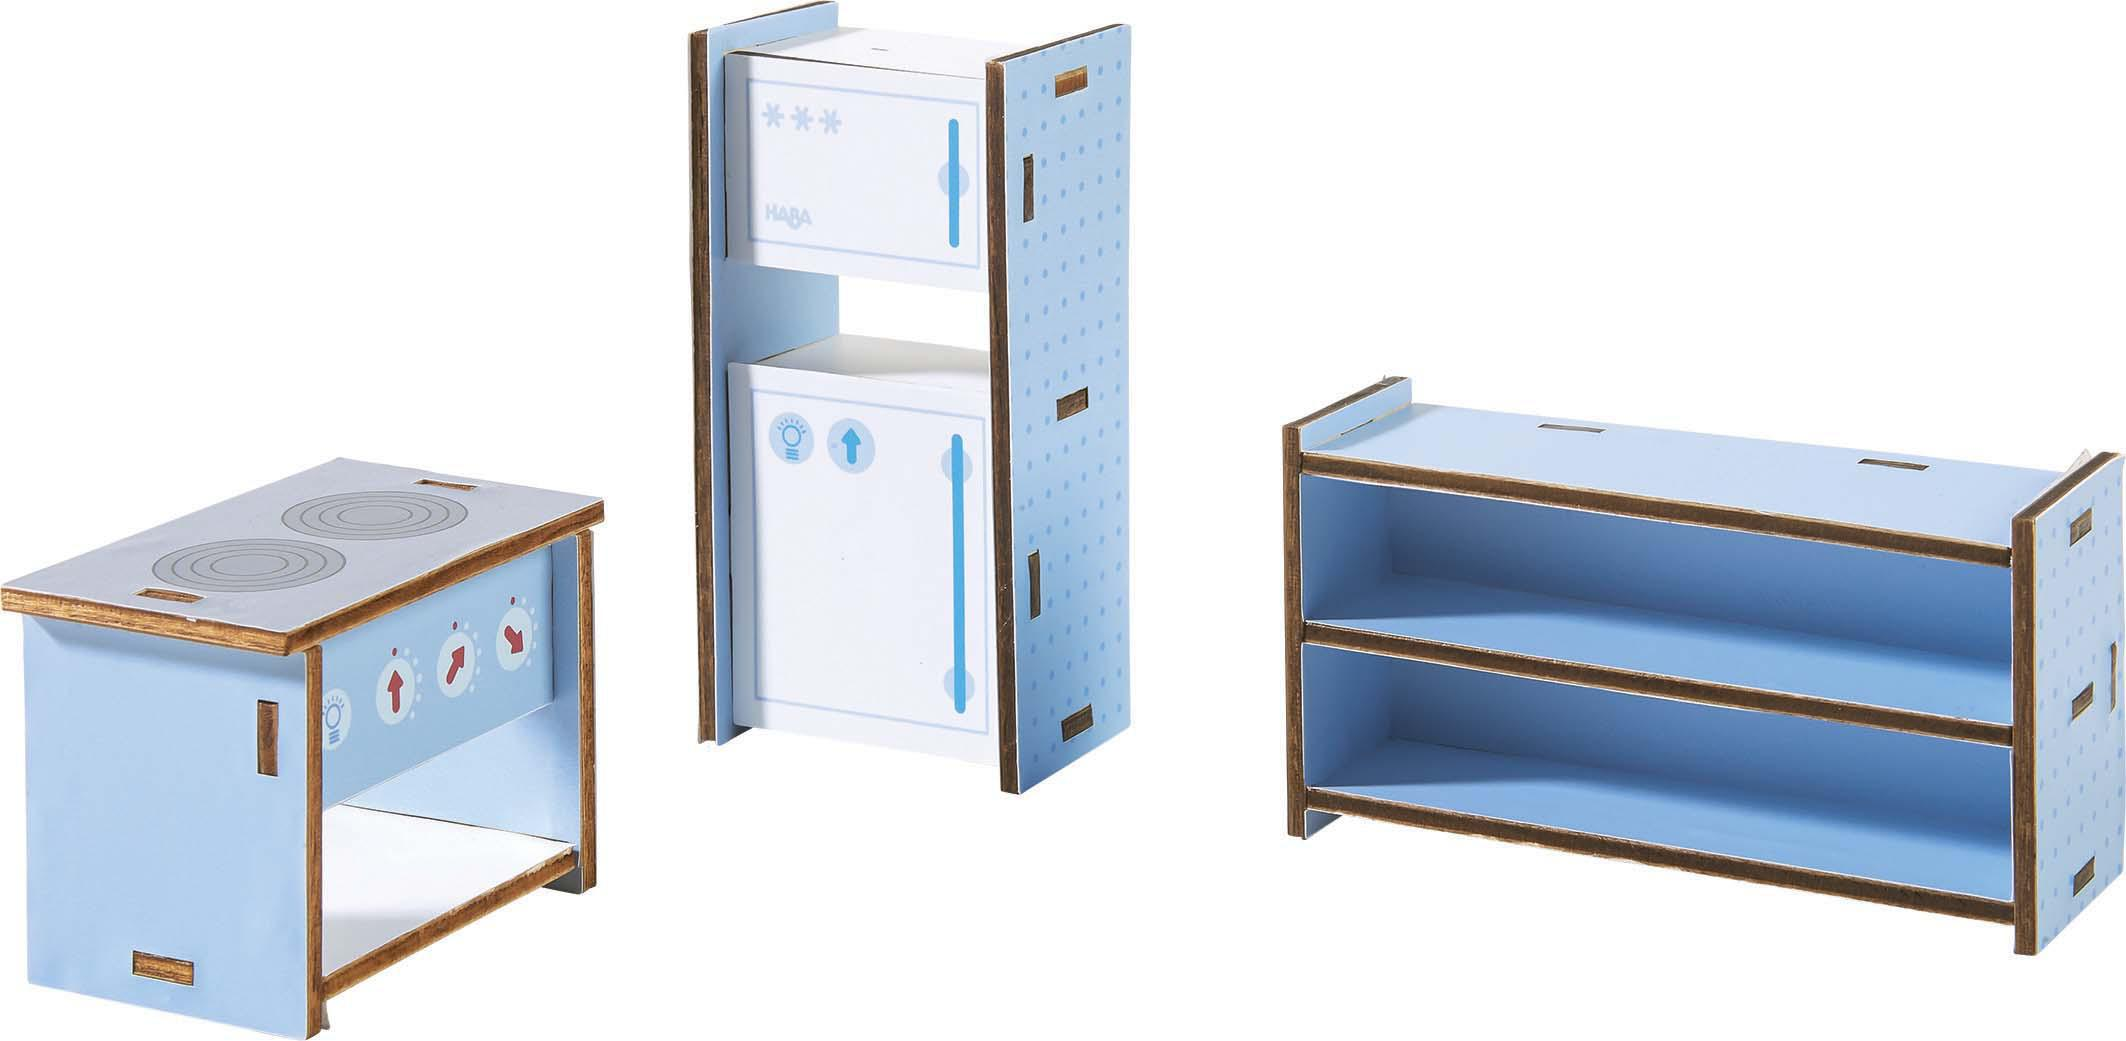 haba puppenhaus m bel k che haba puppenhaus little. Black Bedroom Furniture Sets. Home Design Ideas